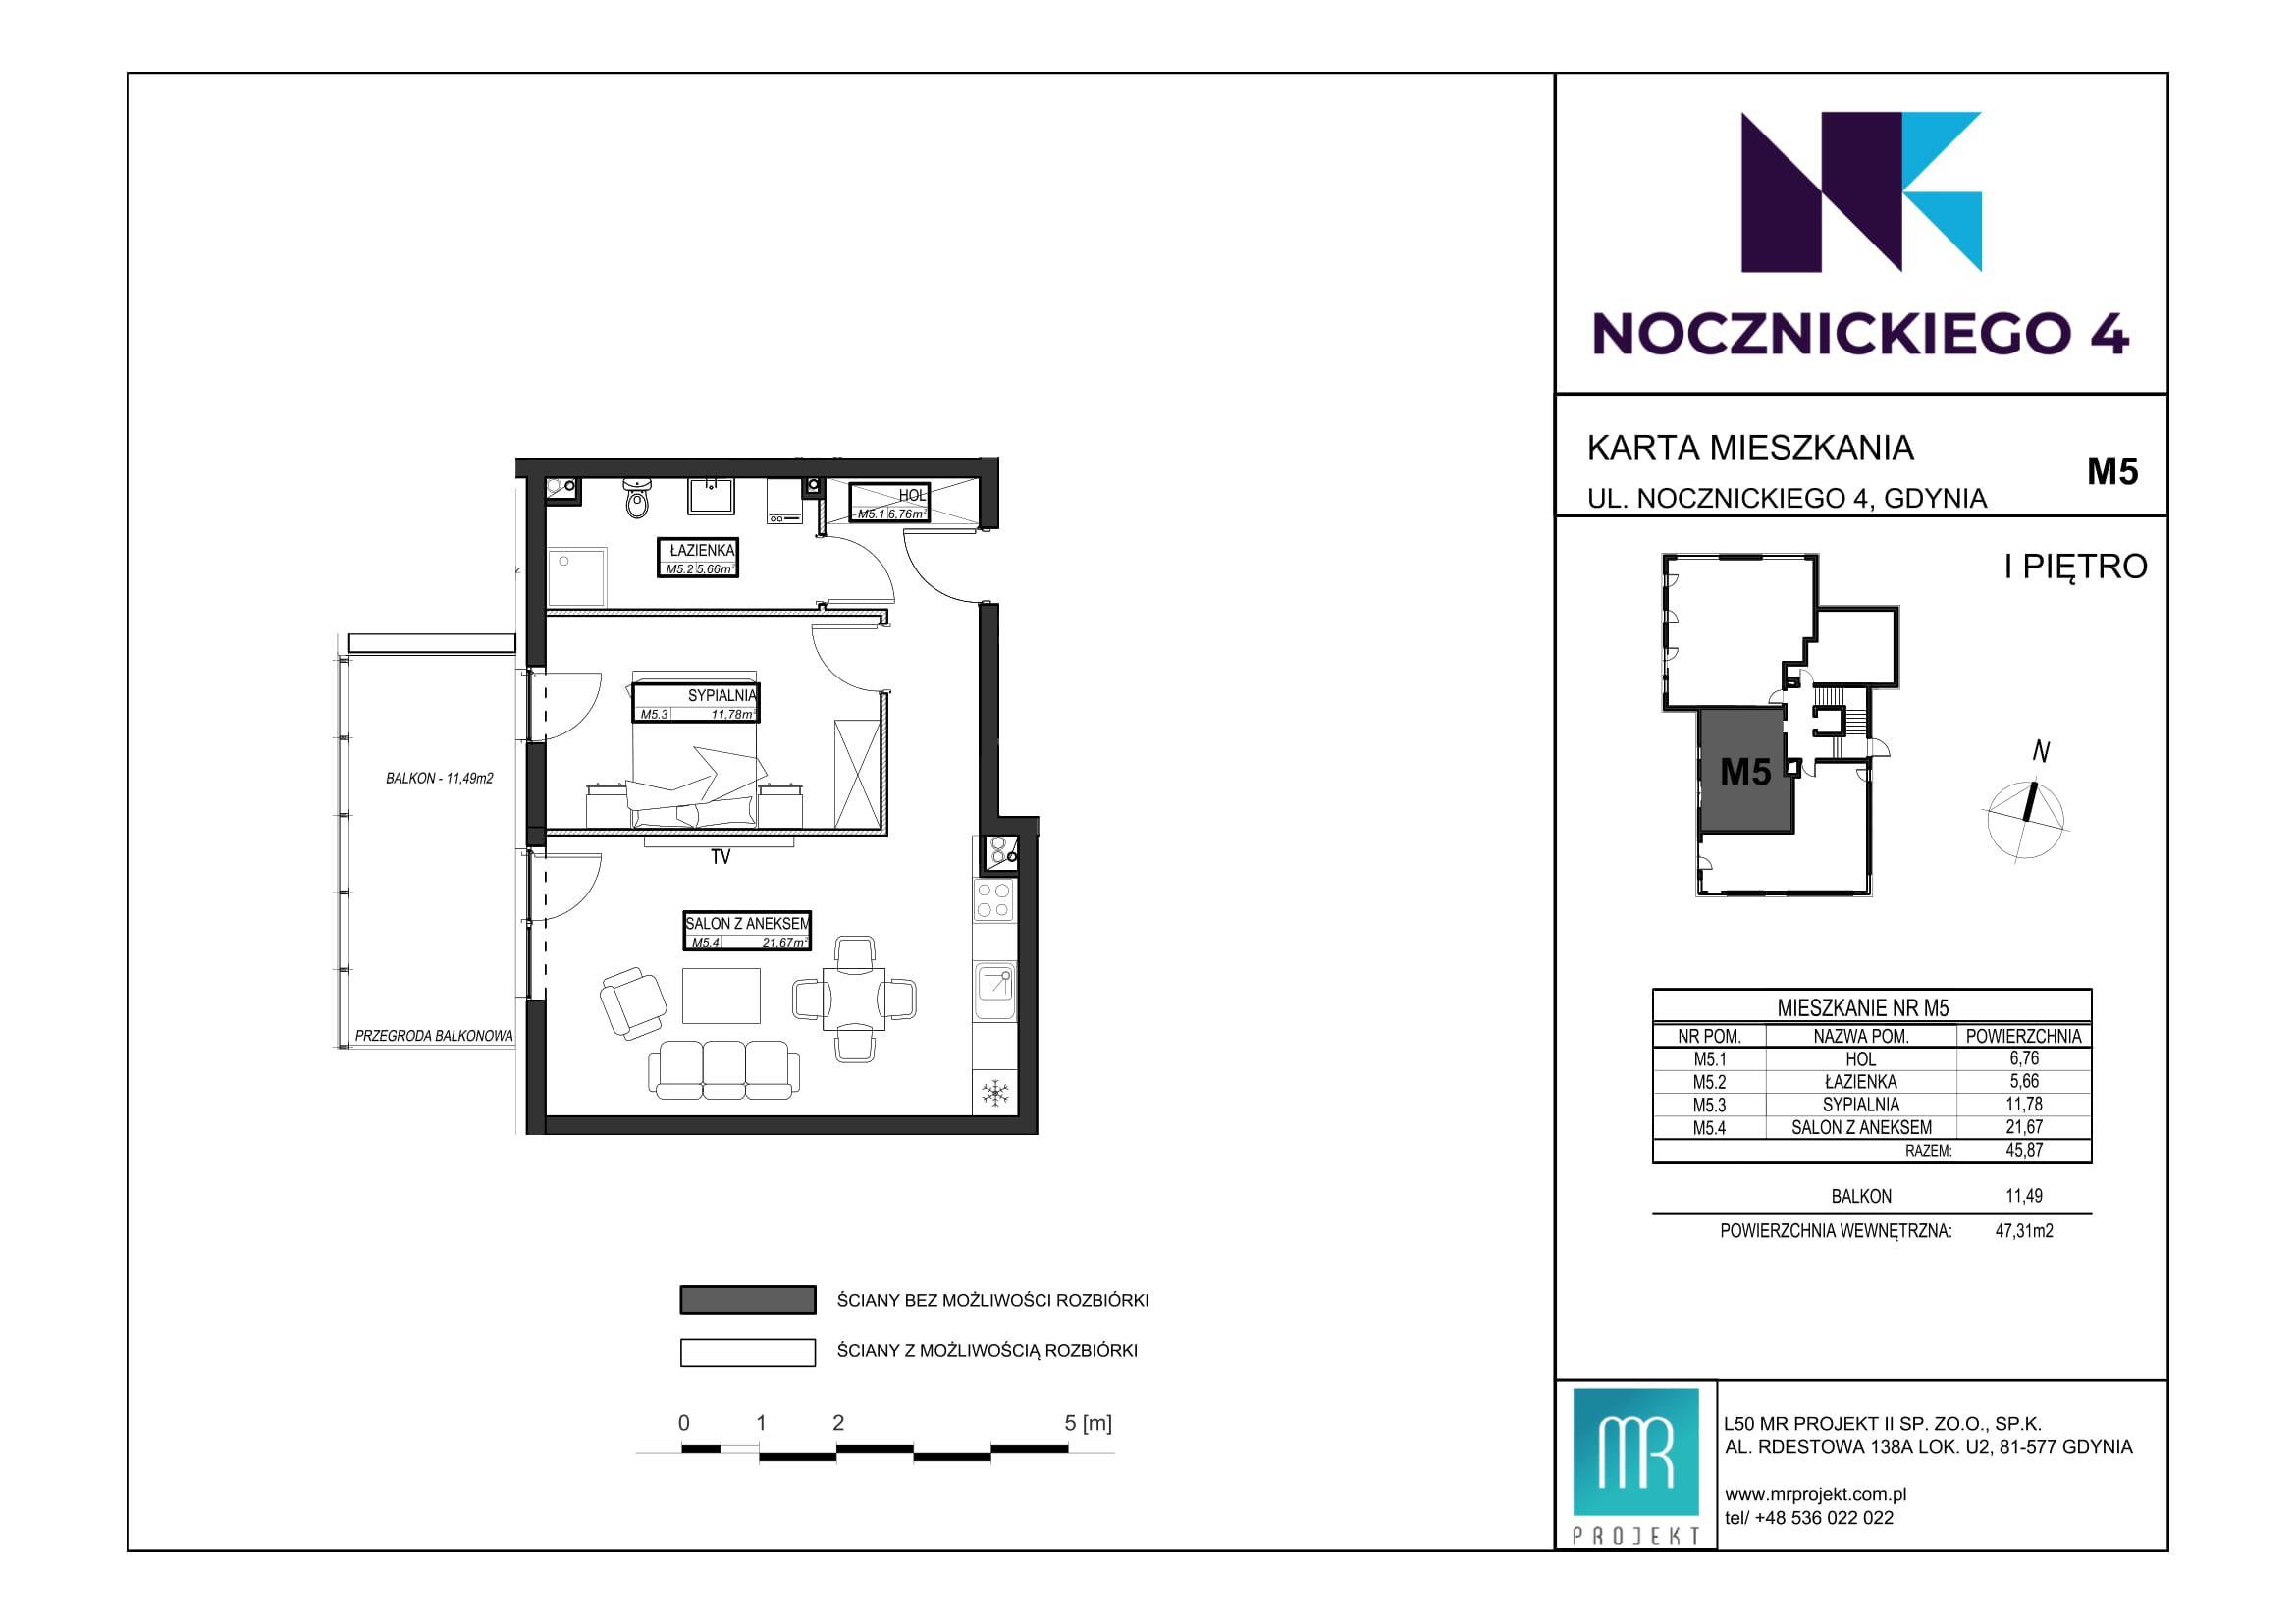 Rzut mieszkania M5